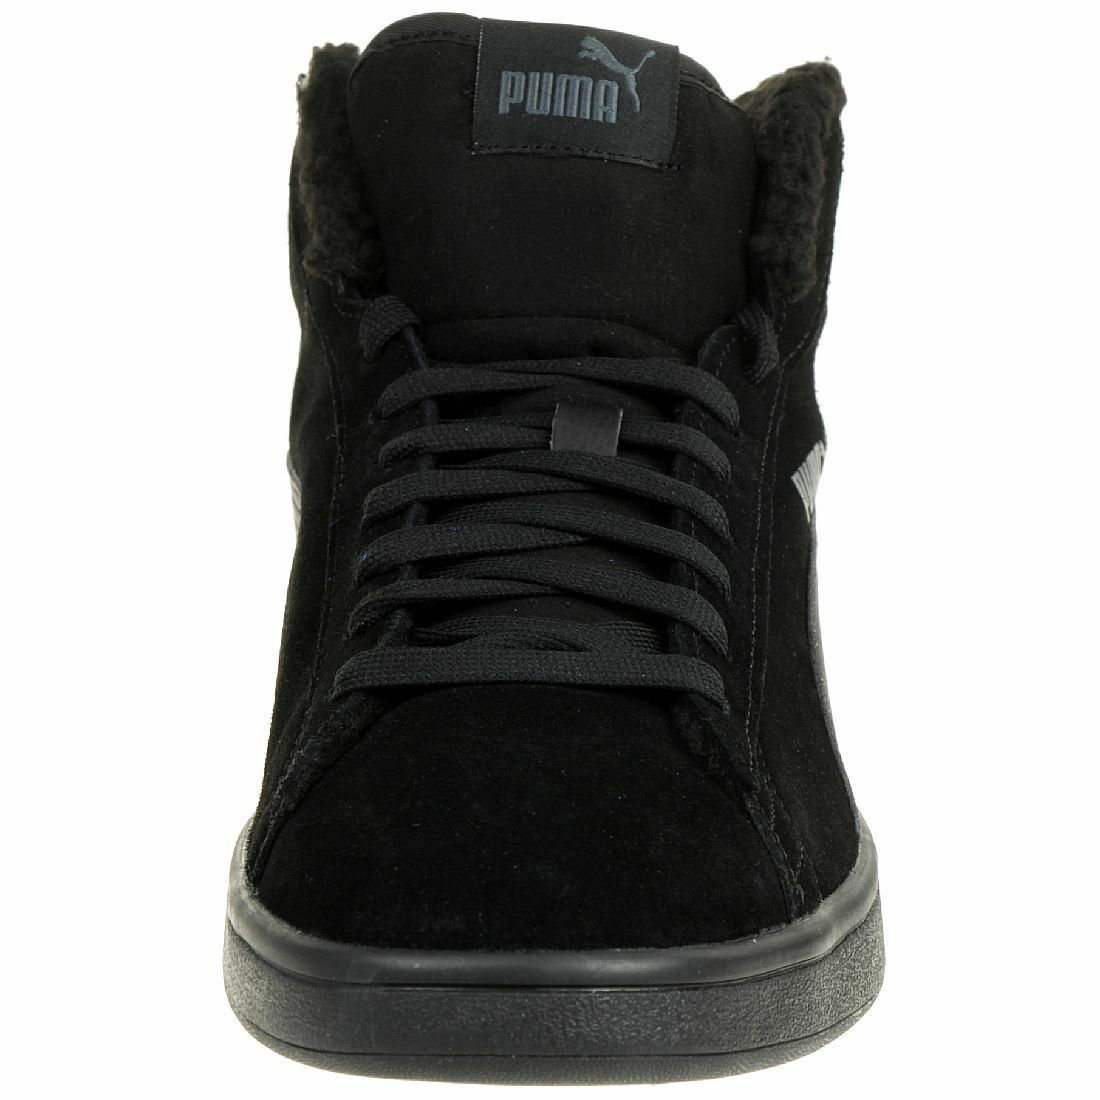 PUMA Smash v2 Mid WTR WTR WTR Unisex scarpe da ginnastica Scarpa Nero Foderato 366810 01   Nuova voce    Sig/Sig Ra Scarpa  e90446